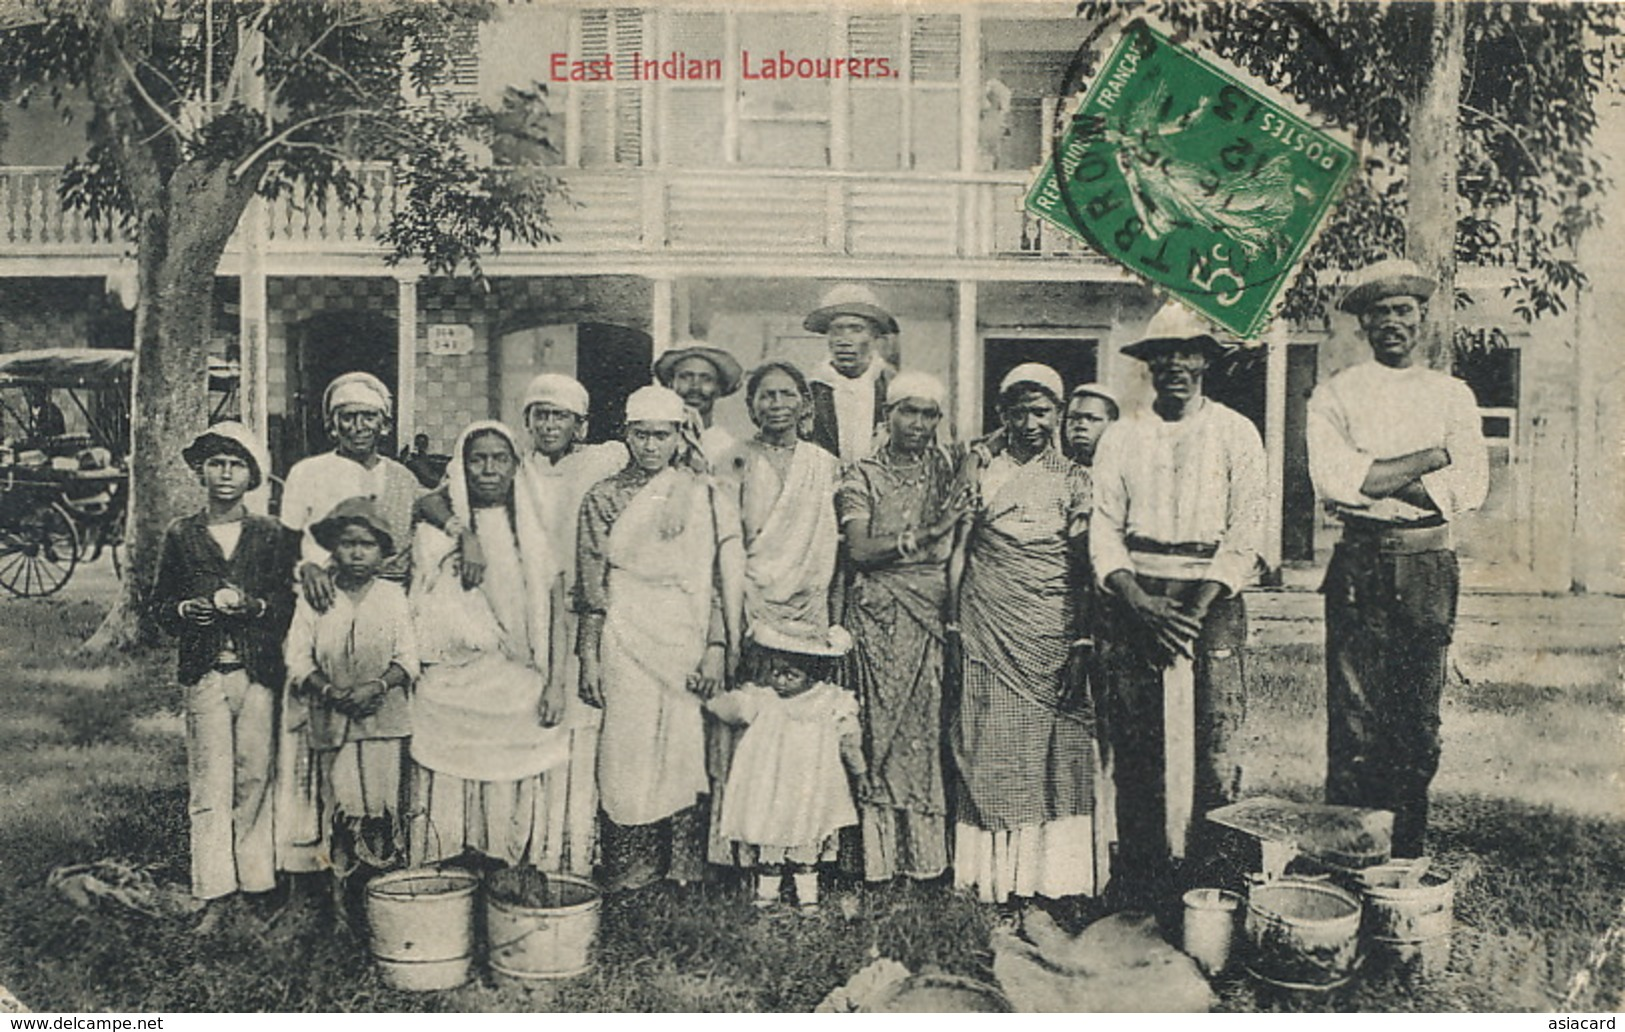 Trinidad East Indian Labourers Edit Waterman  Light Defect Bottom Right Corner - Trinidad